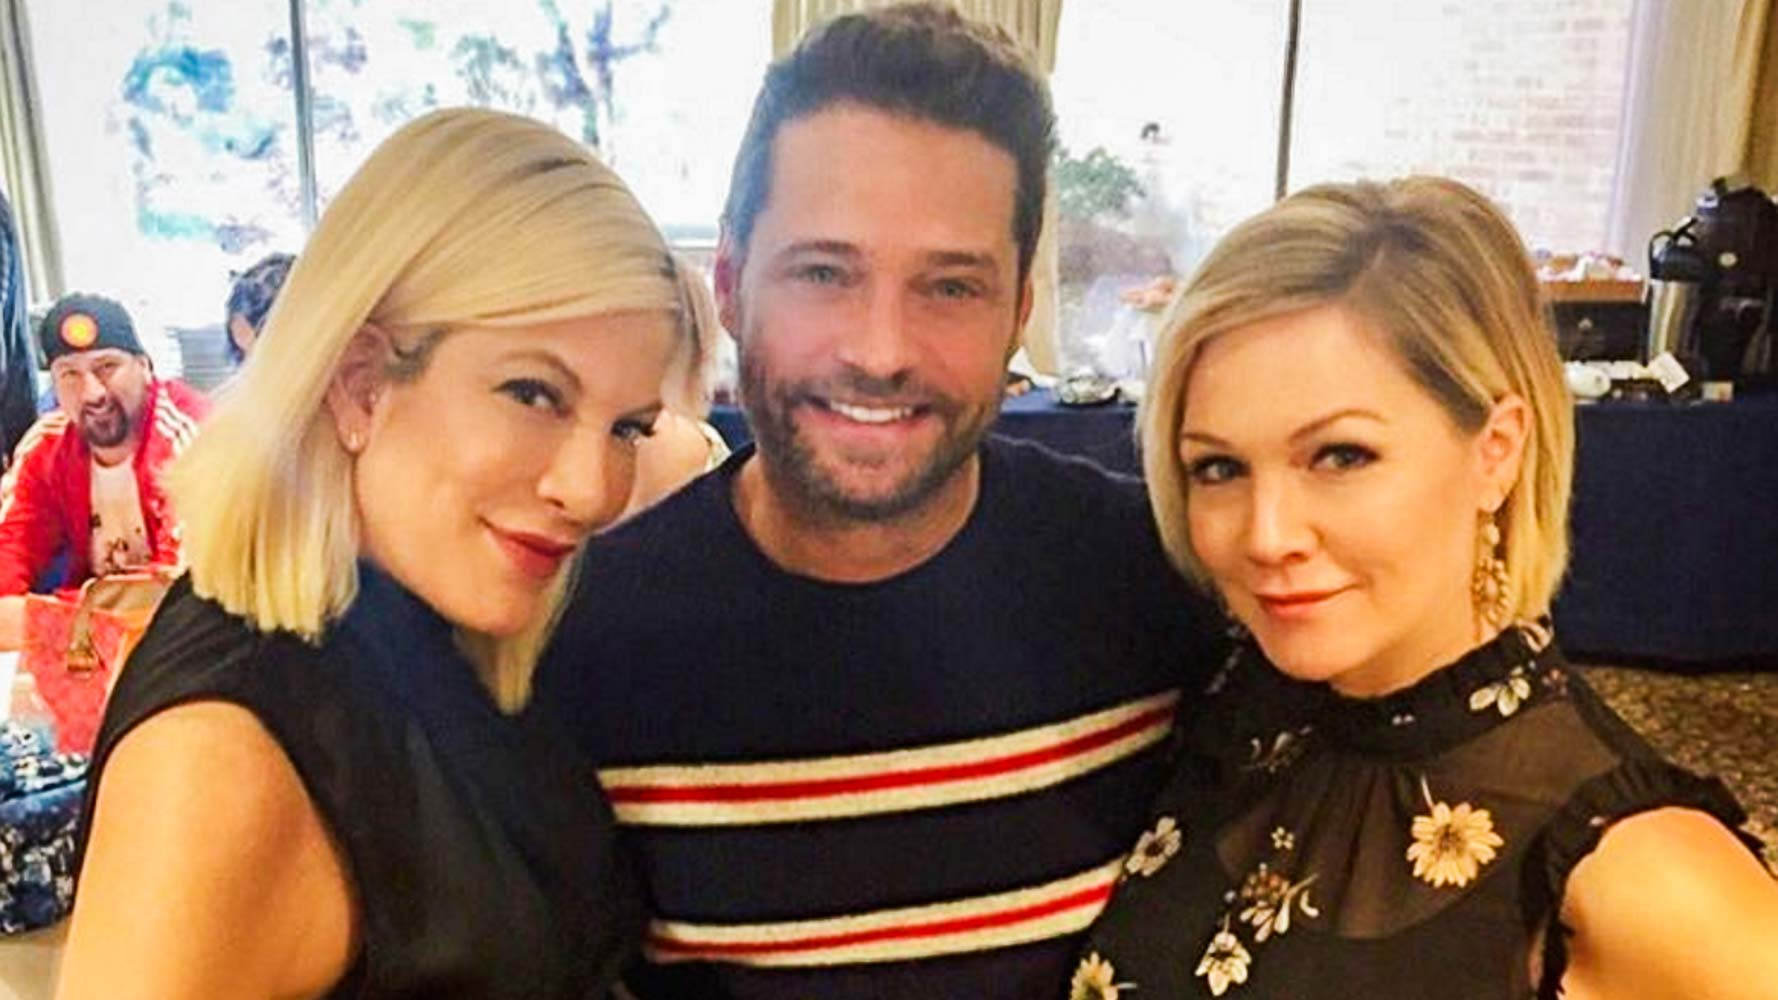 IN PHOTOS: 'Beverly Hills 90210' stars reunite